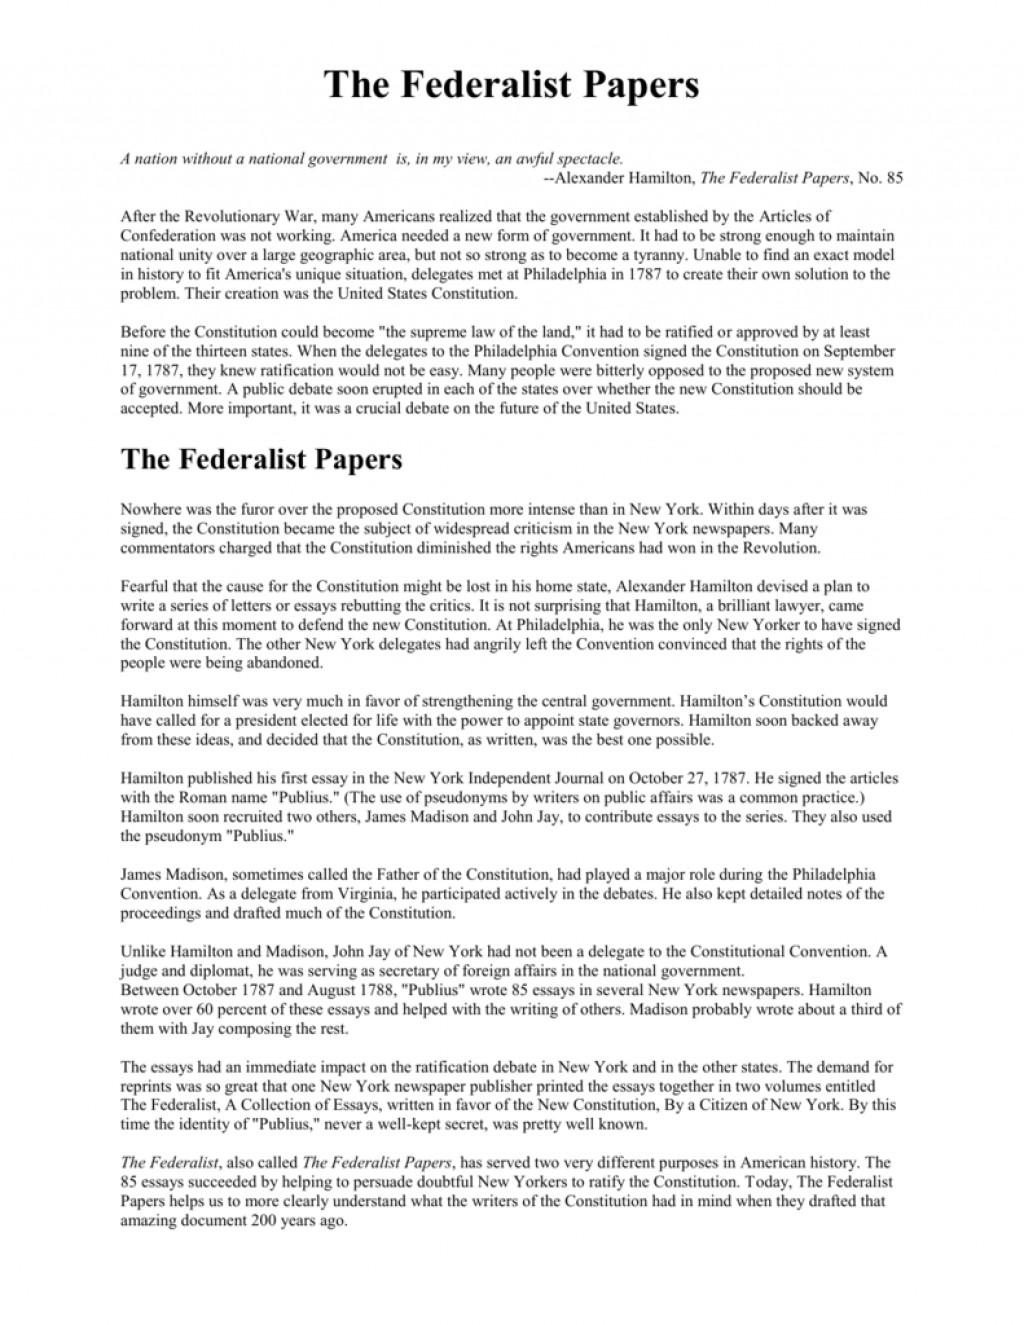 Reflective essay editing services gb